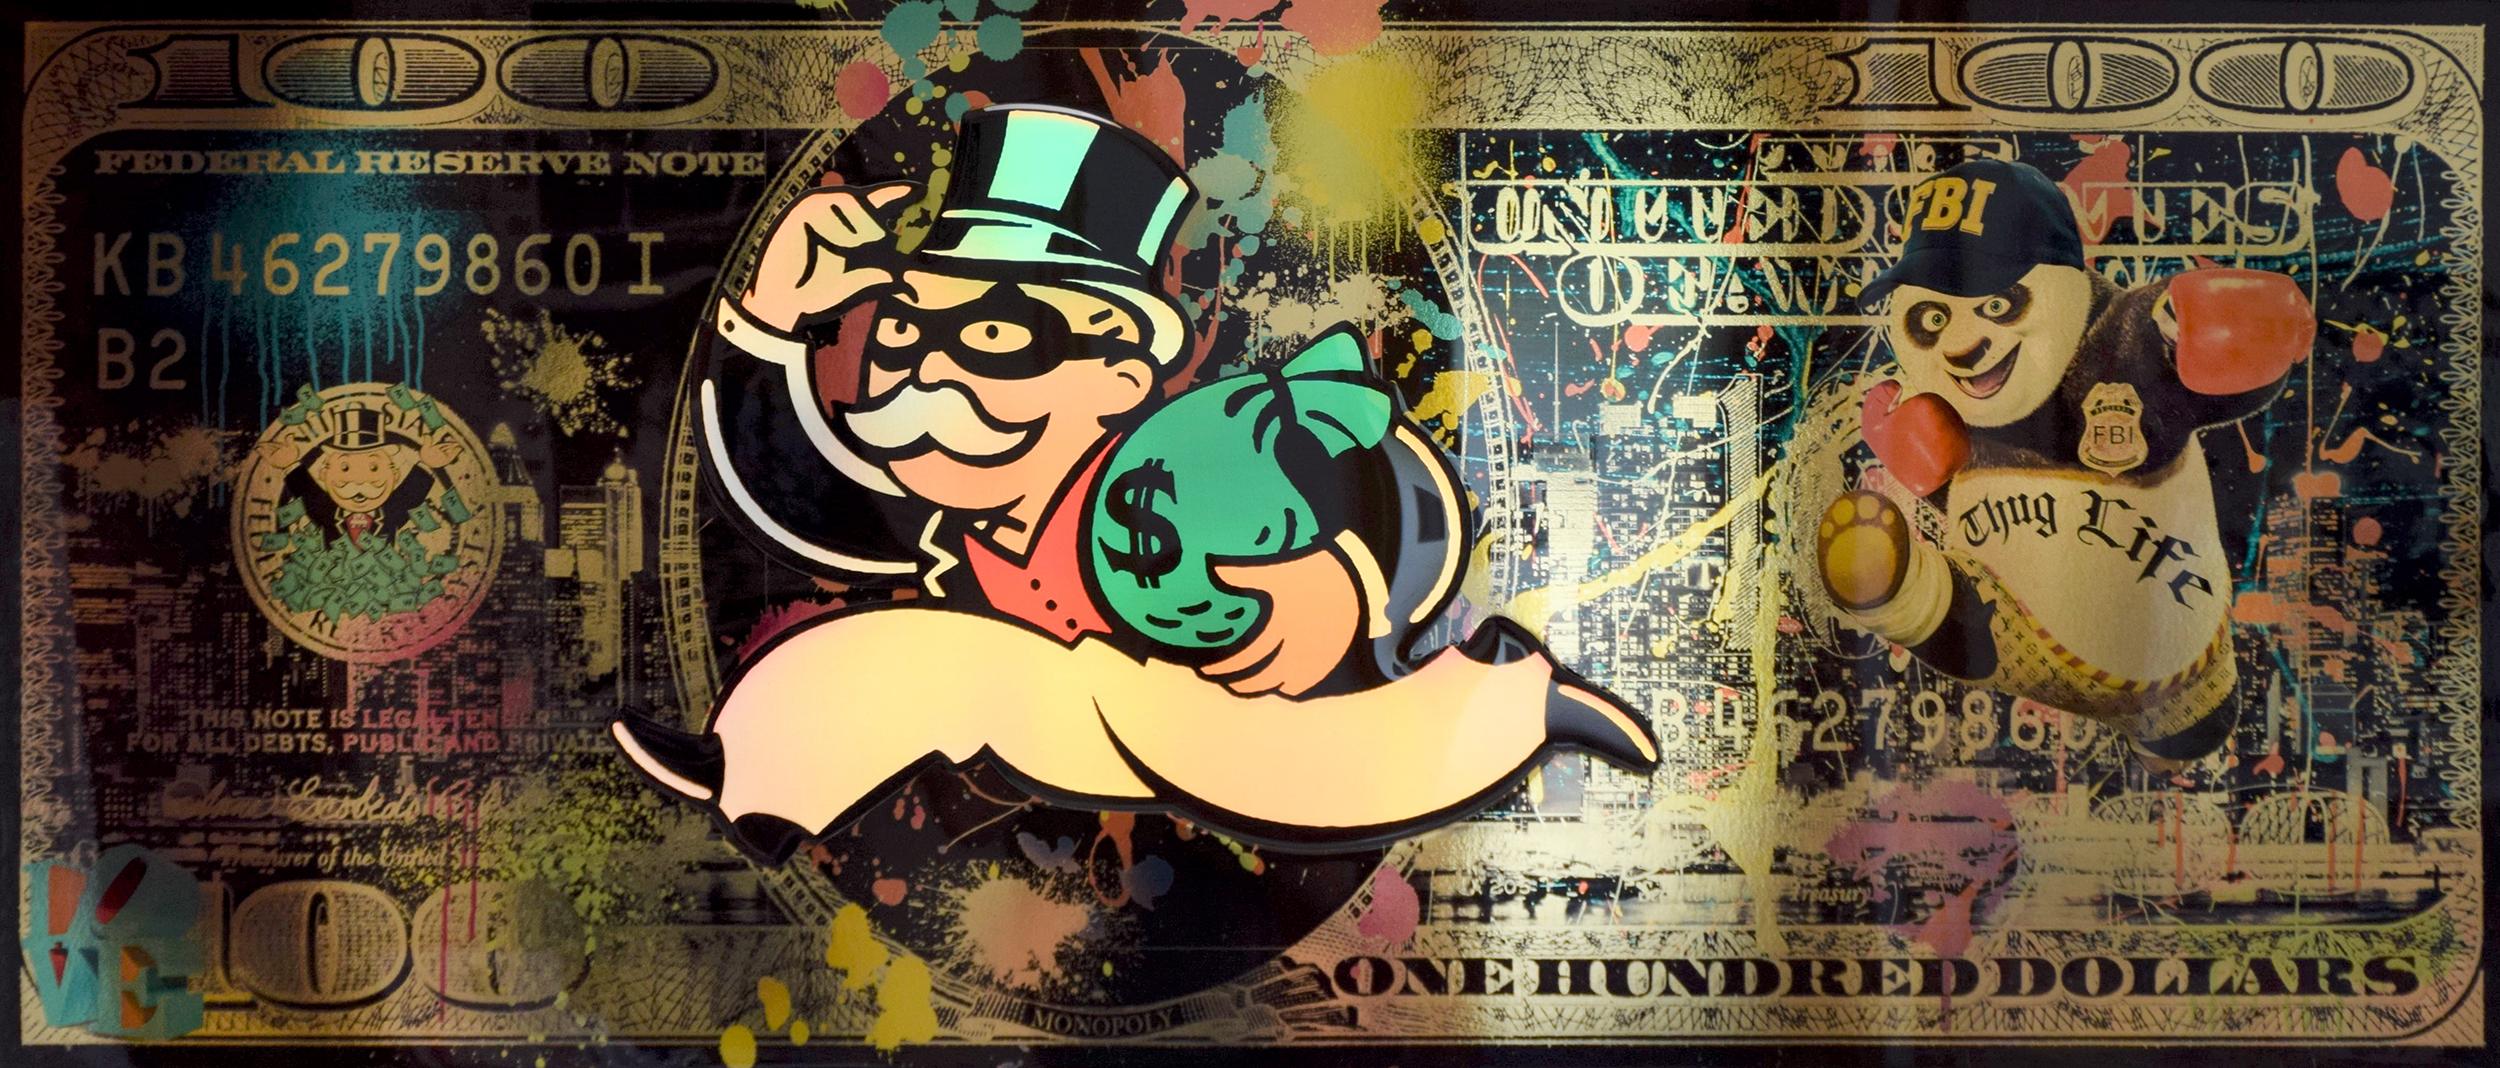 Diederik - Mr. Bandit Monopoly , 4504-016-260